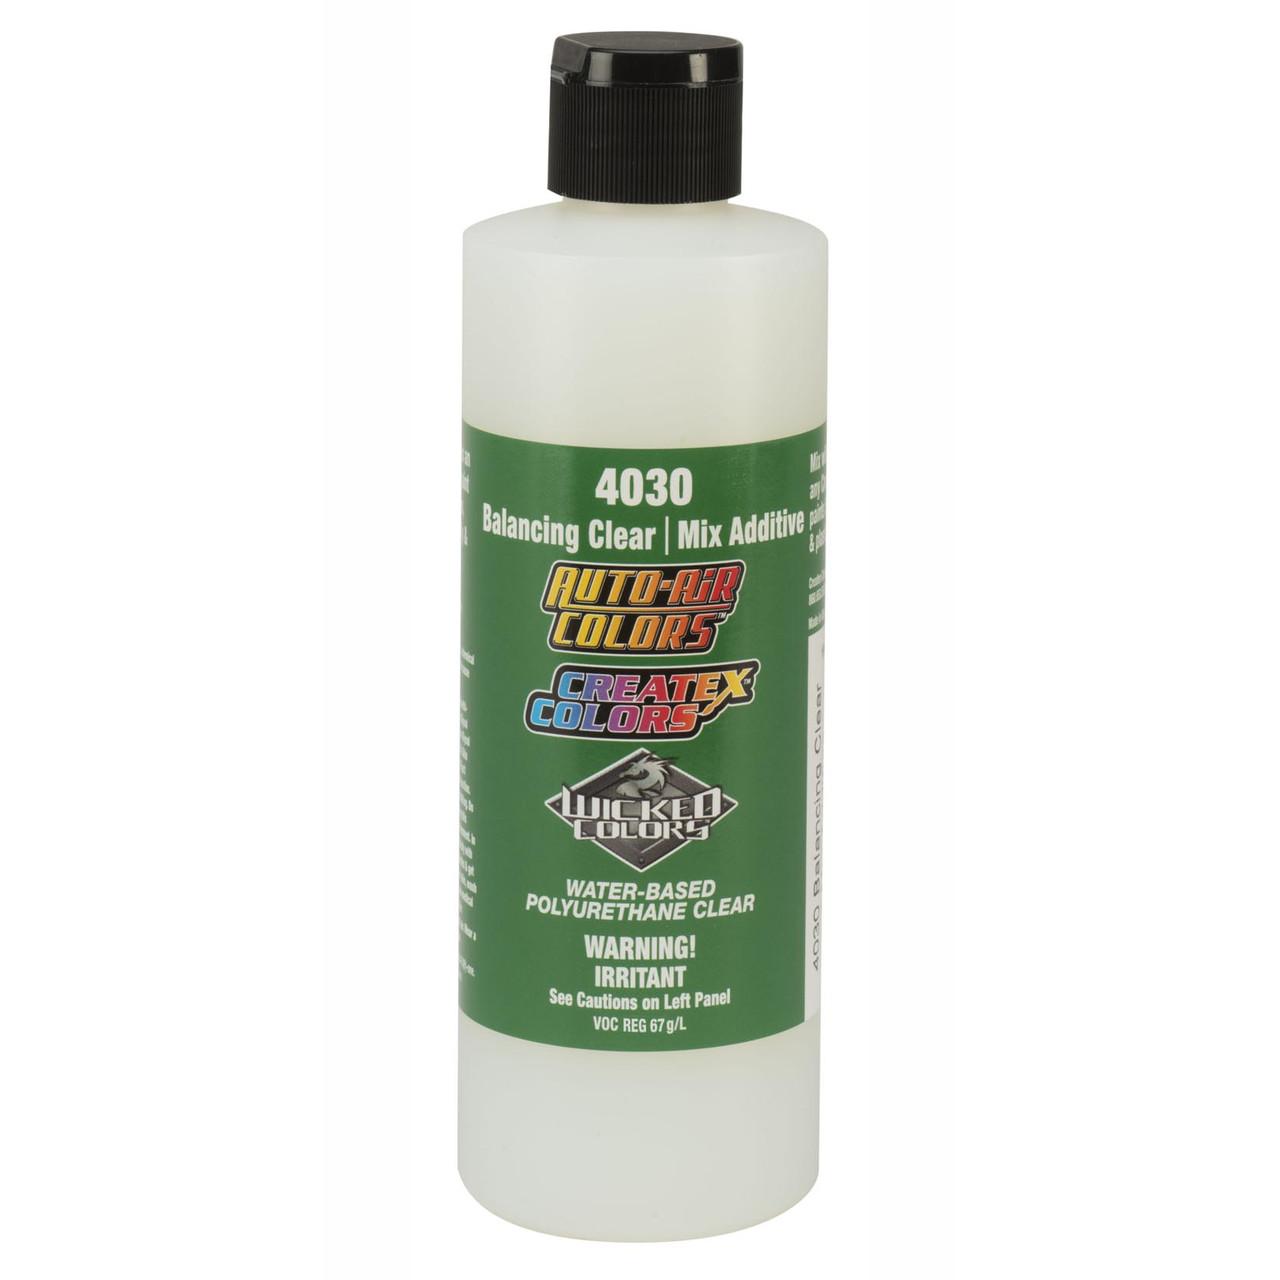 Balancing Clear | Mix Additive (смола полиуретановая), 60 мл